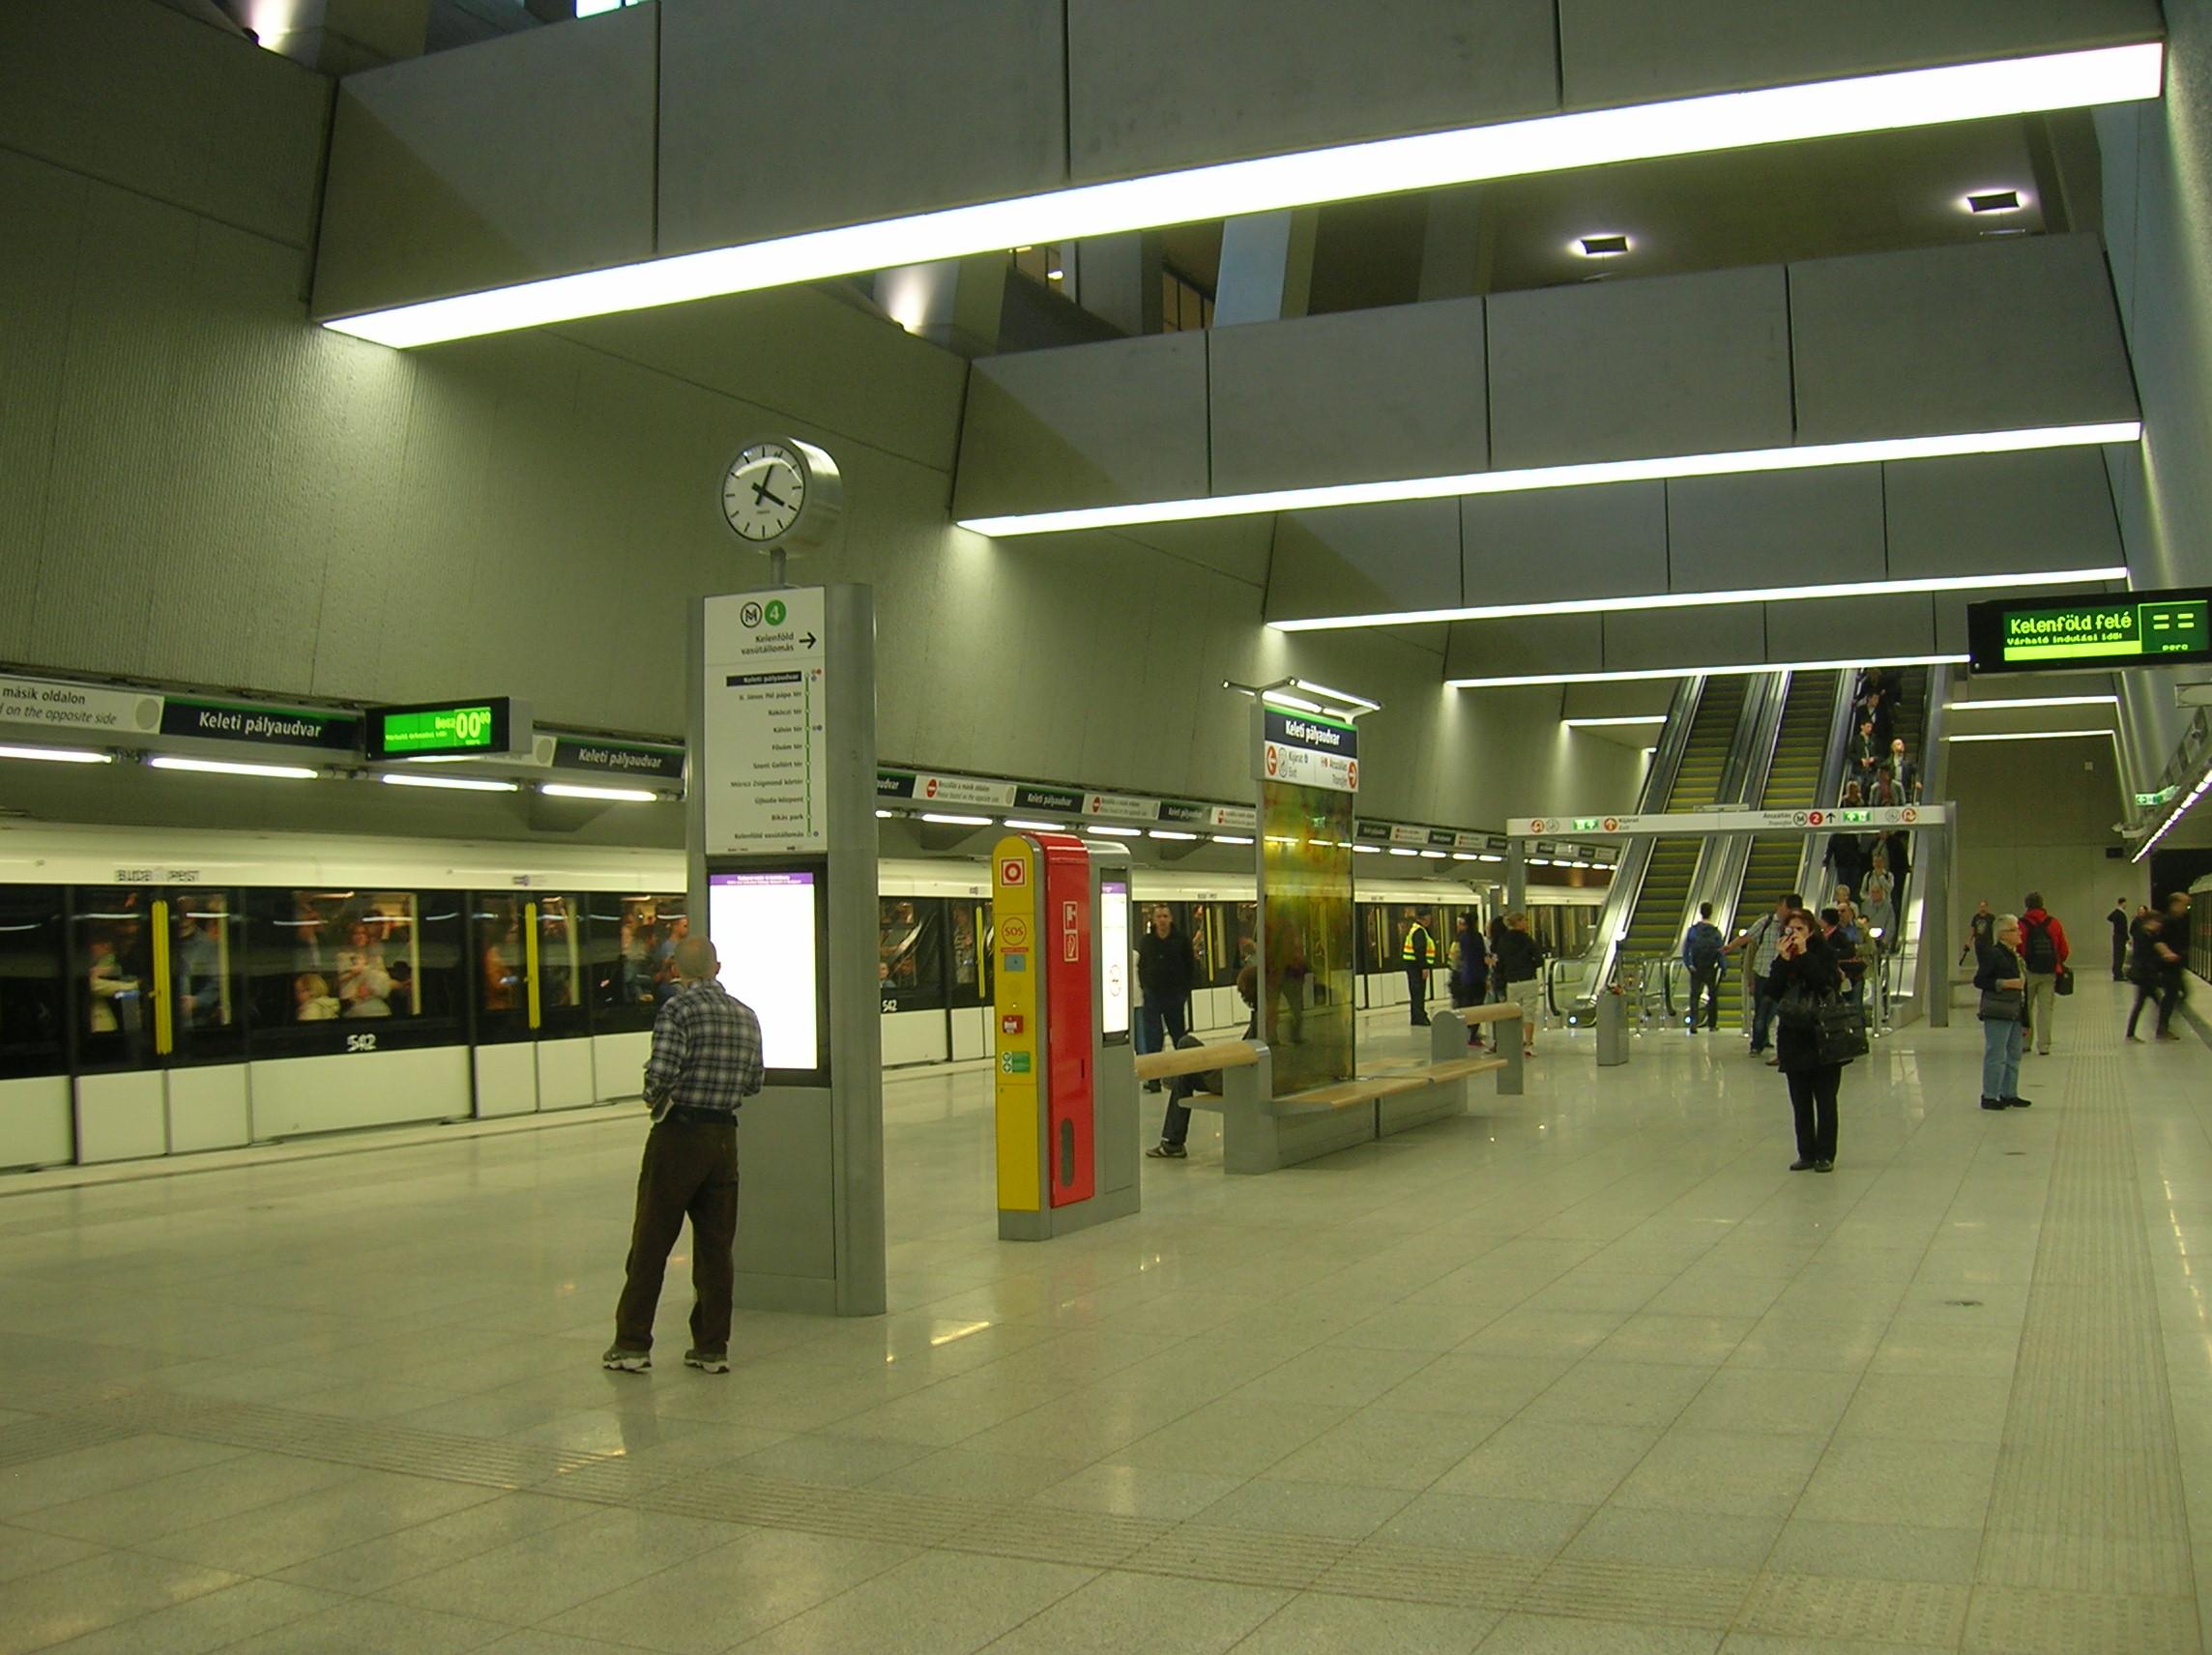 keleti p lyaudvar budapest metro wikiwand. Black Bedroom Furniture Sets. Home Design Ideas